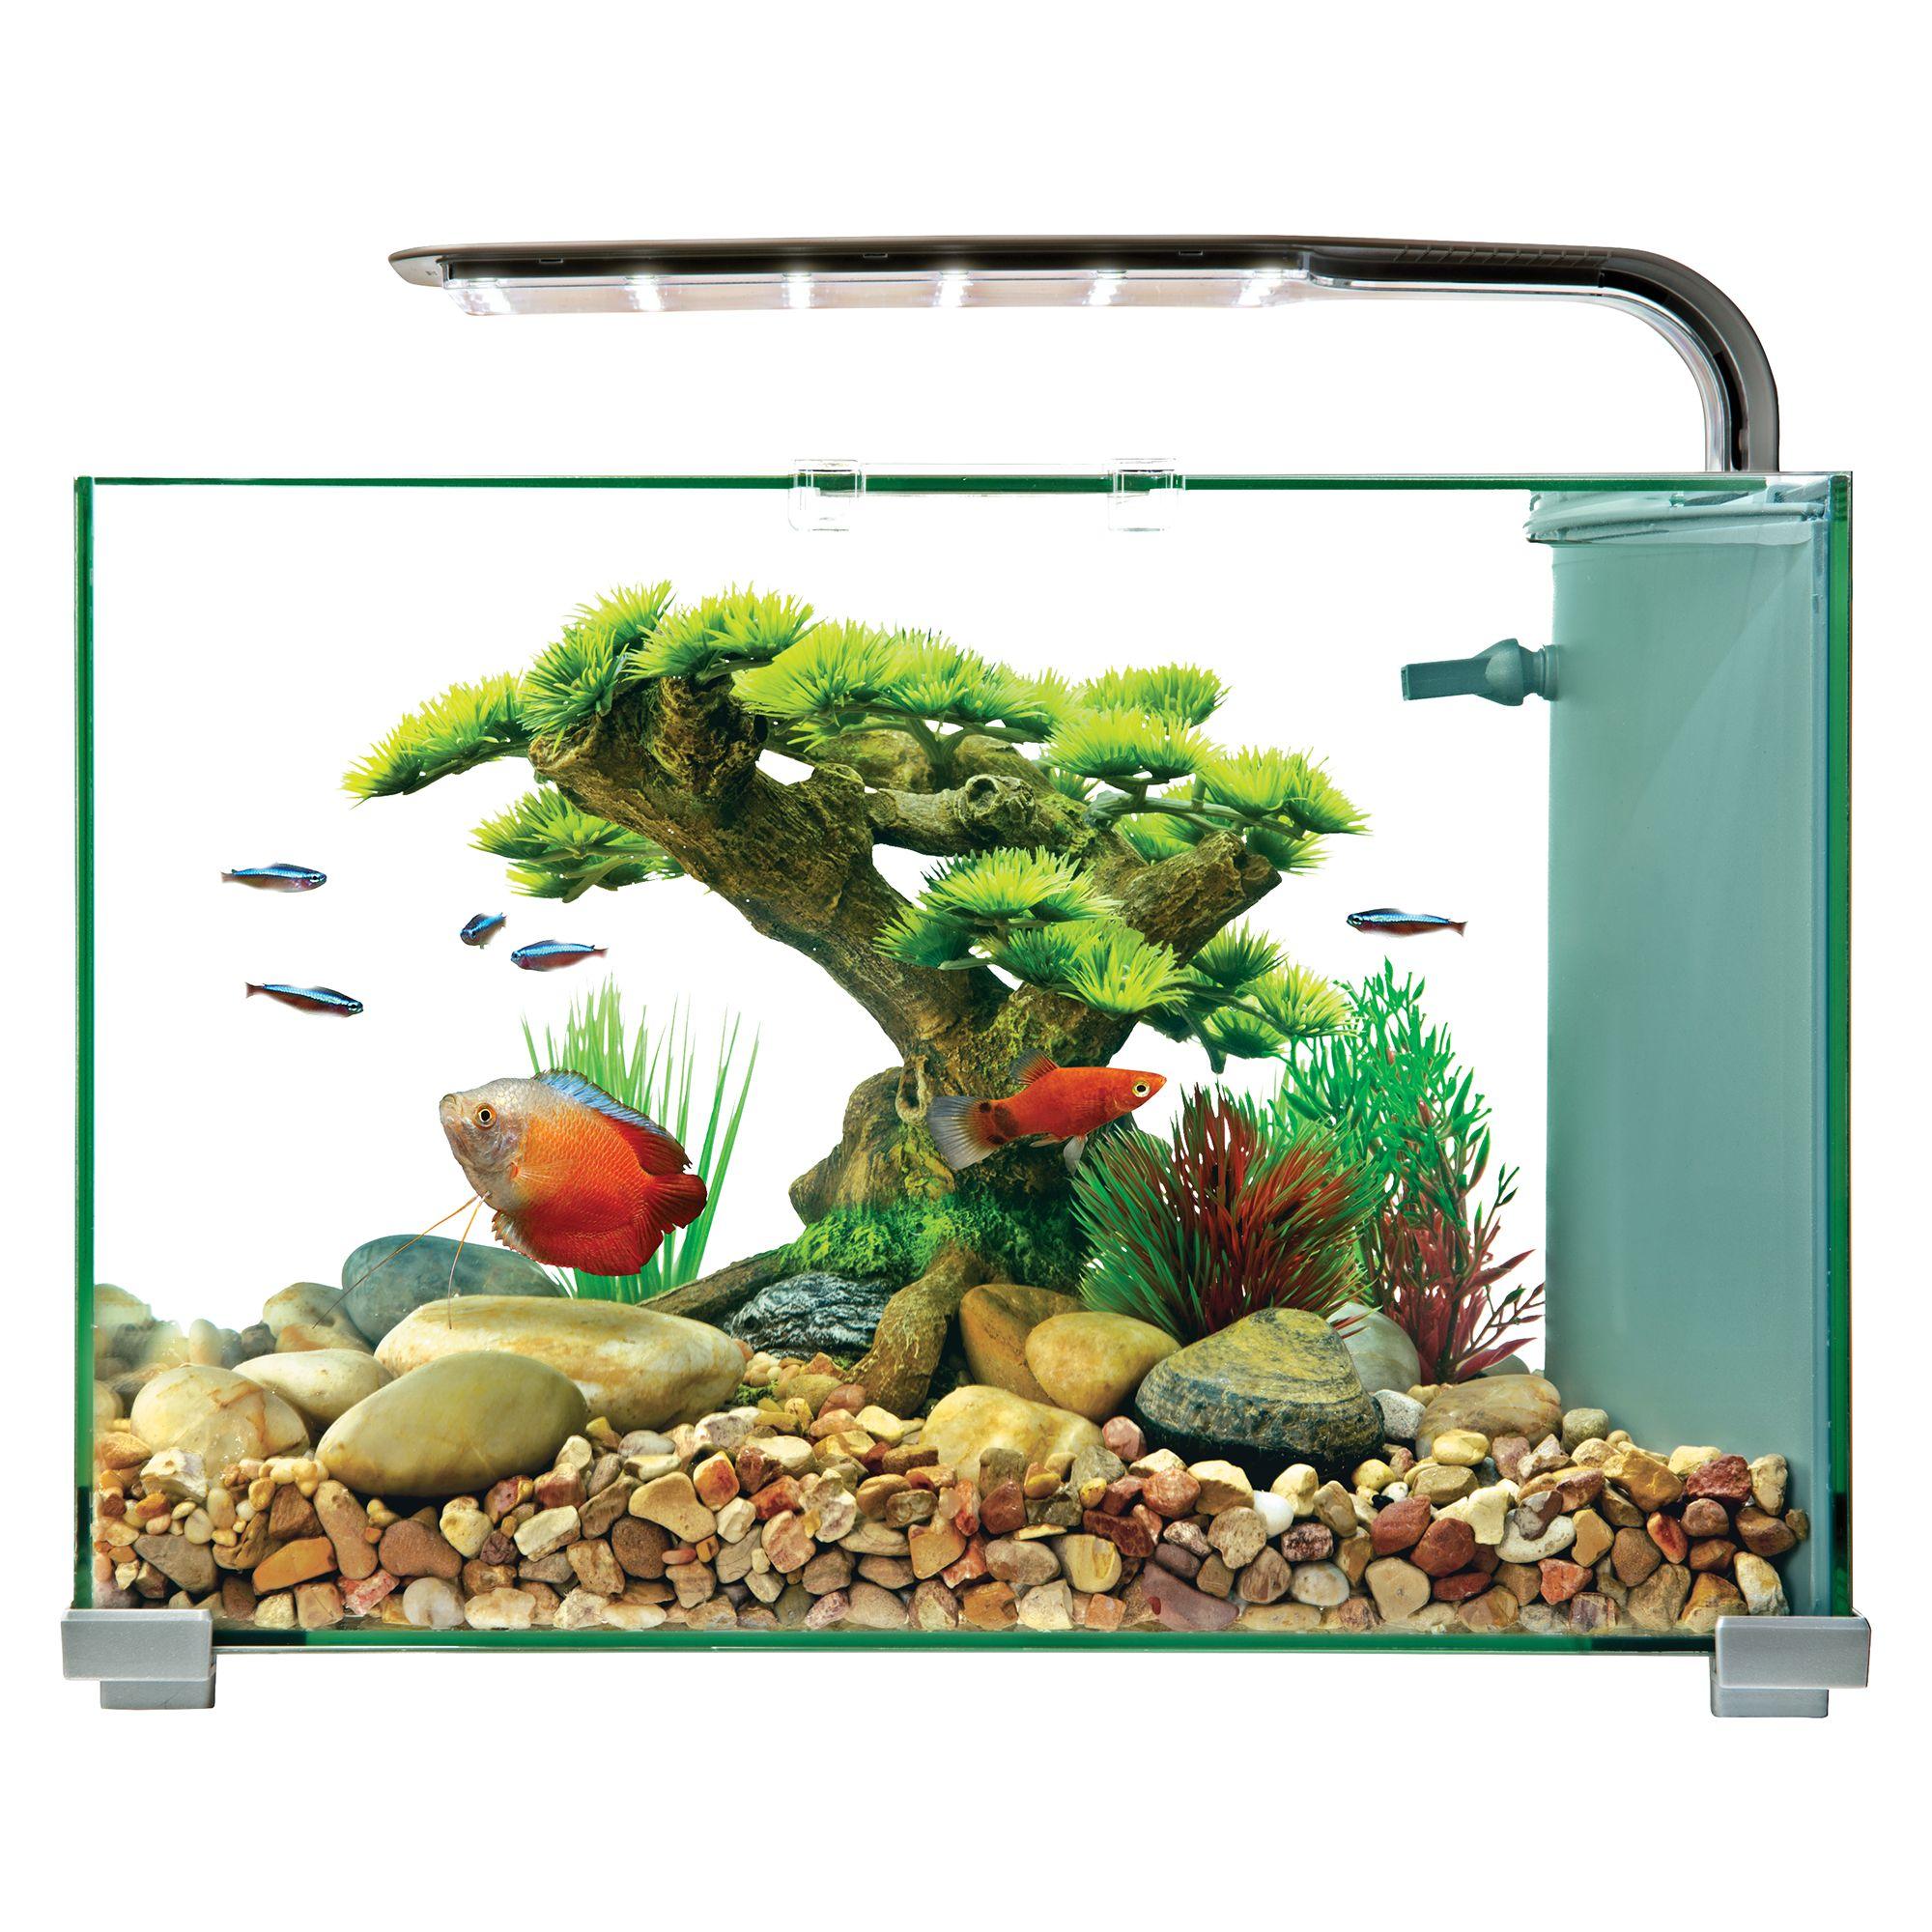 Top Fin Retreat Aquarium Fish Starter Kits Petsmart